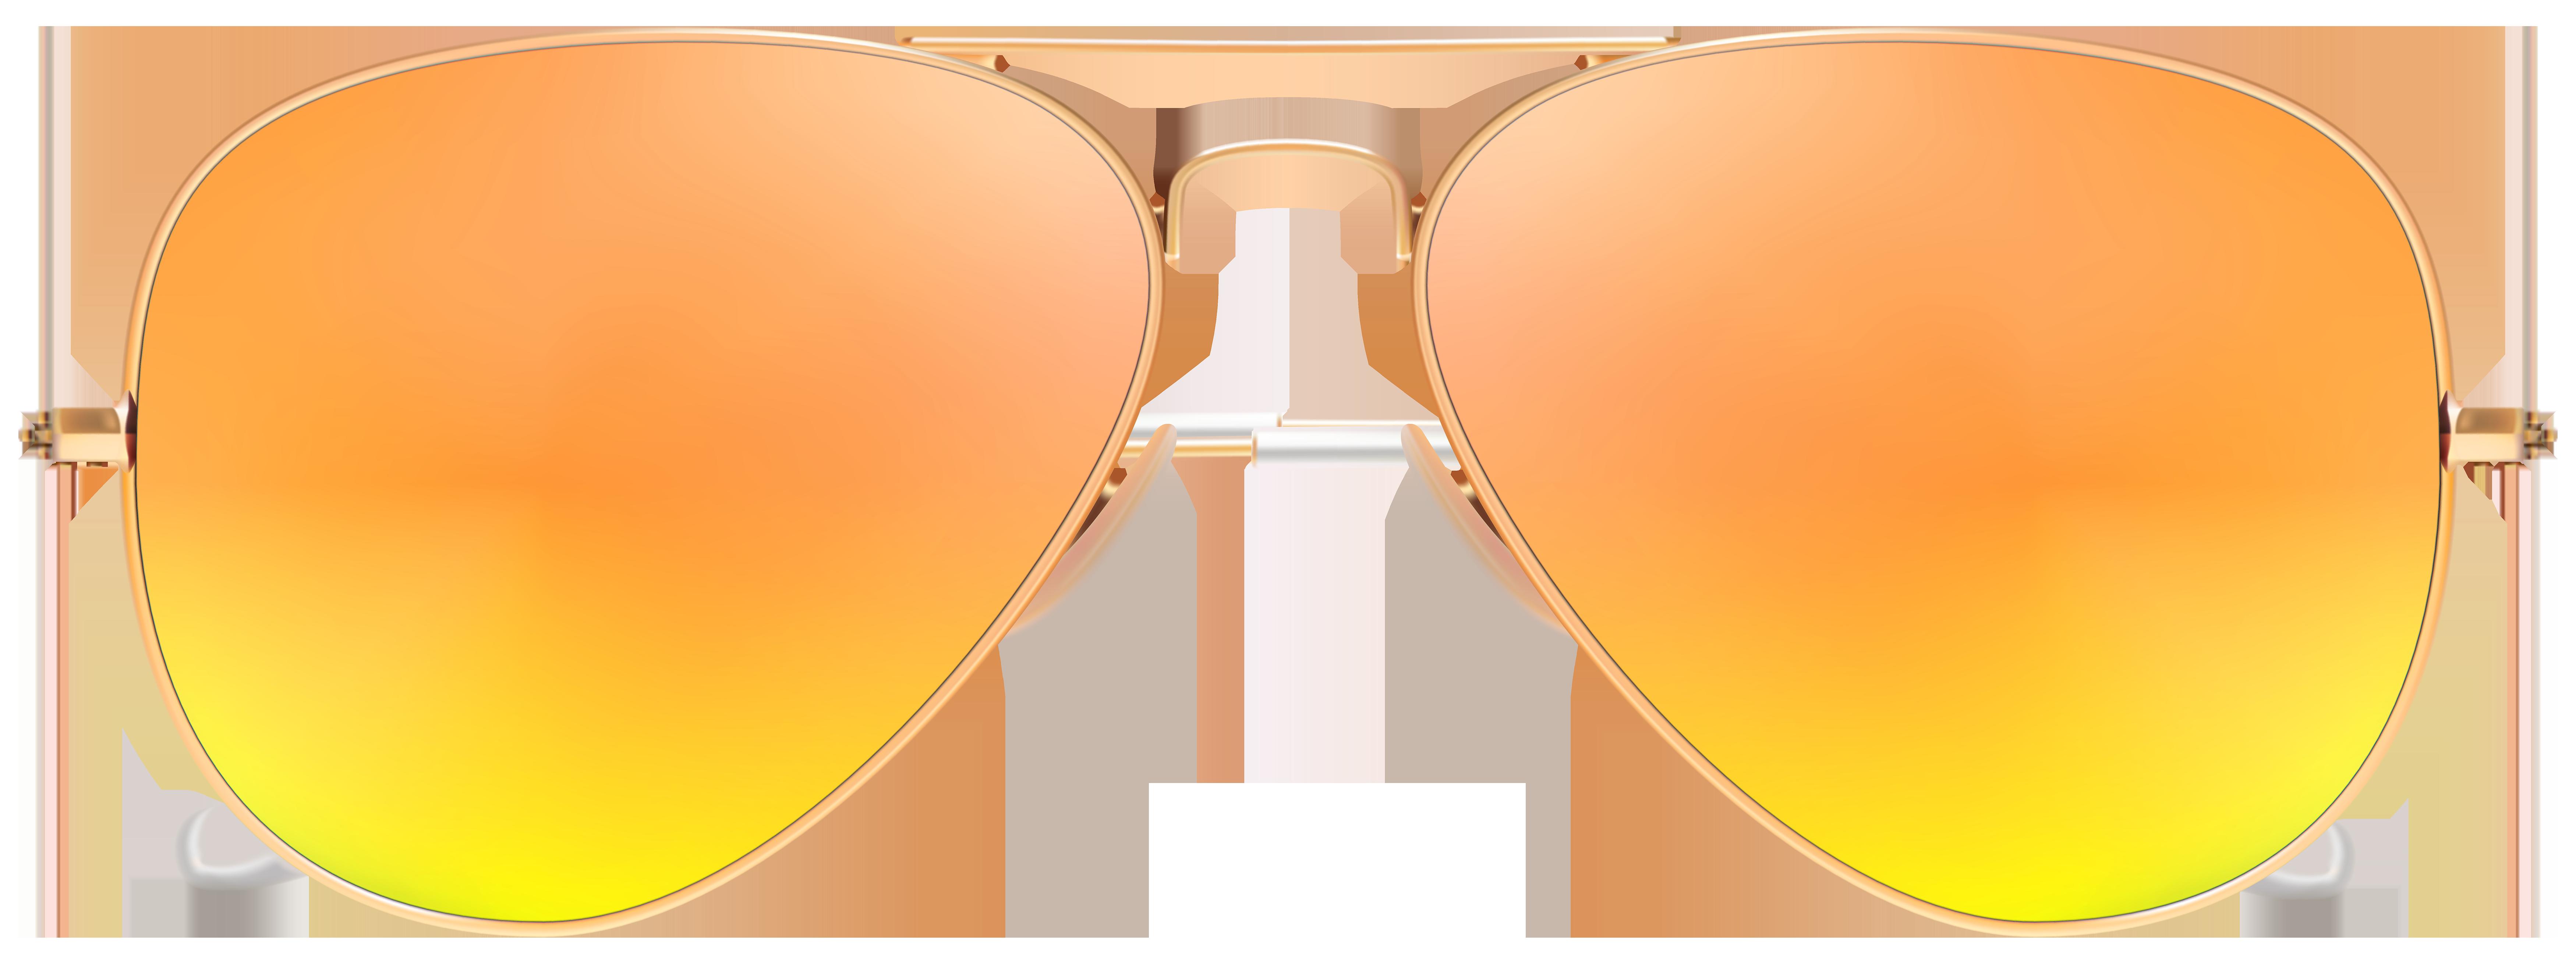 Sunglasses clipart overlay. Png transparent clip art